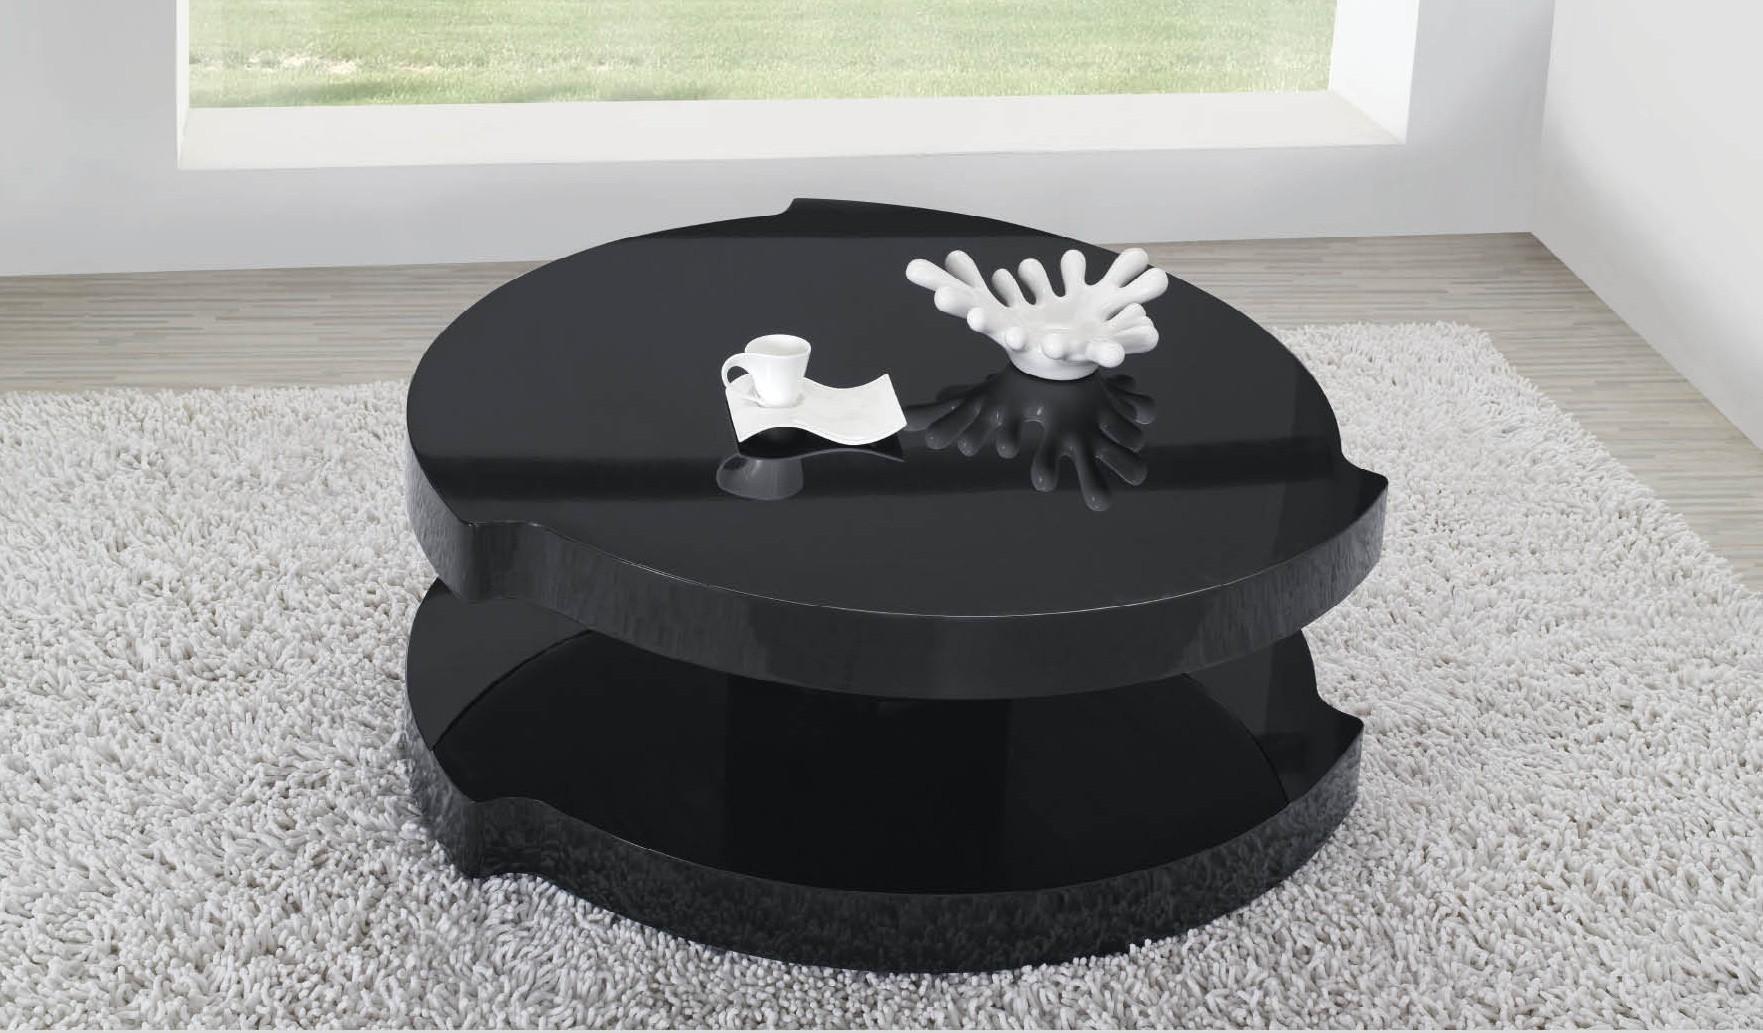 Table Basse Ronde Design Pas Cher Atwebsterfr Maison Et Mobilier